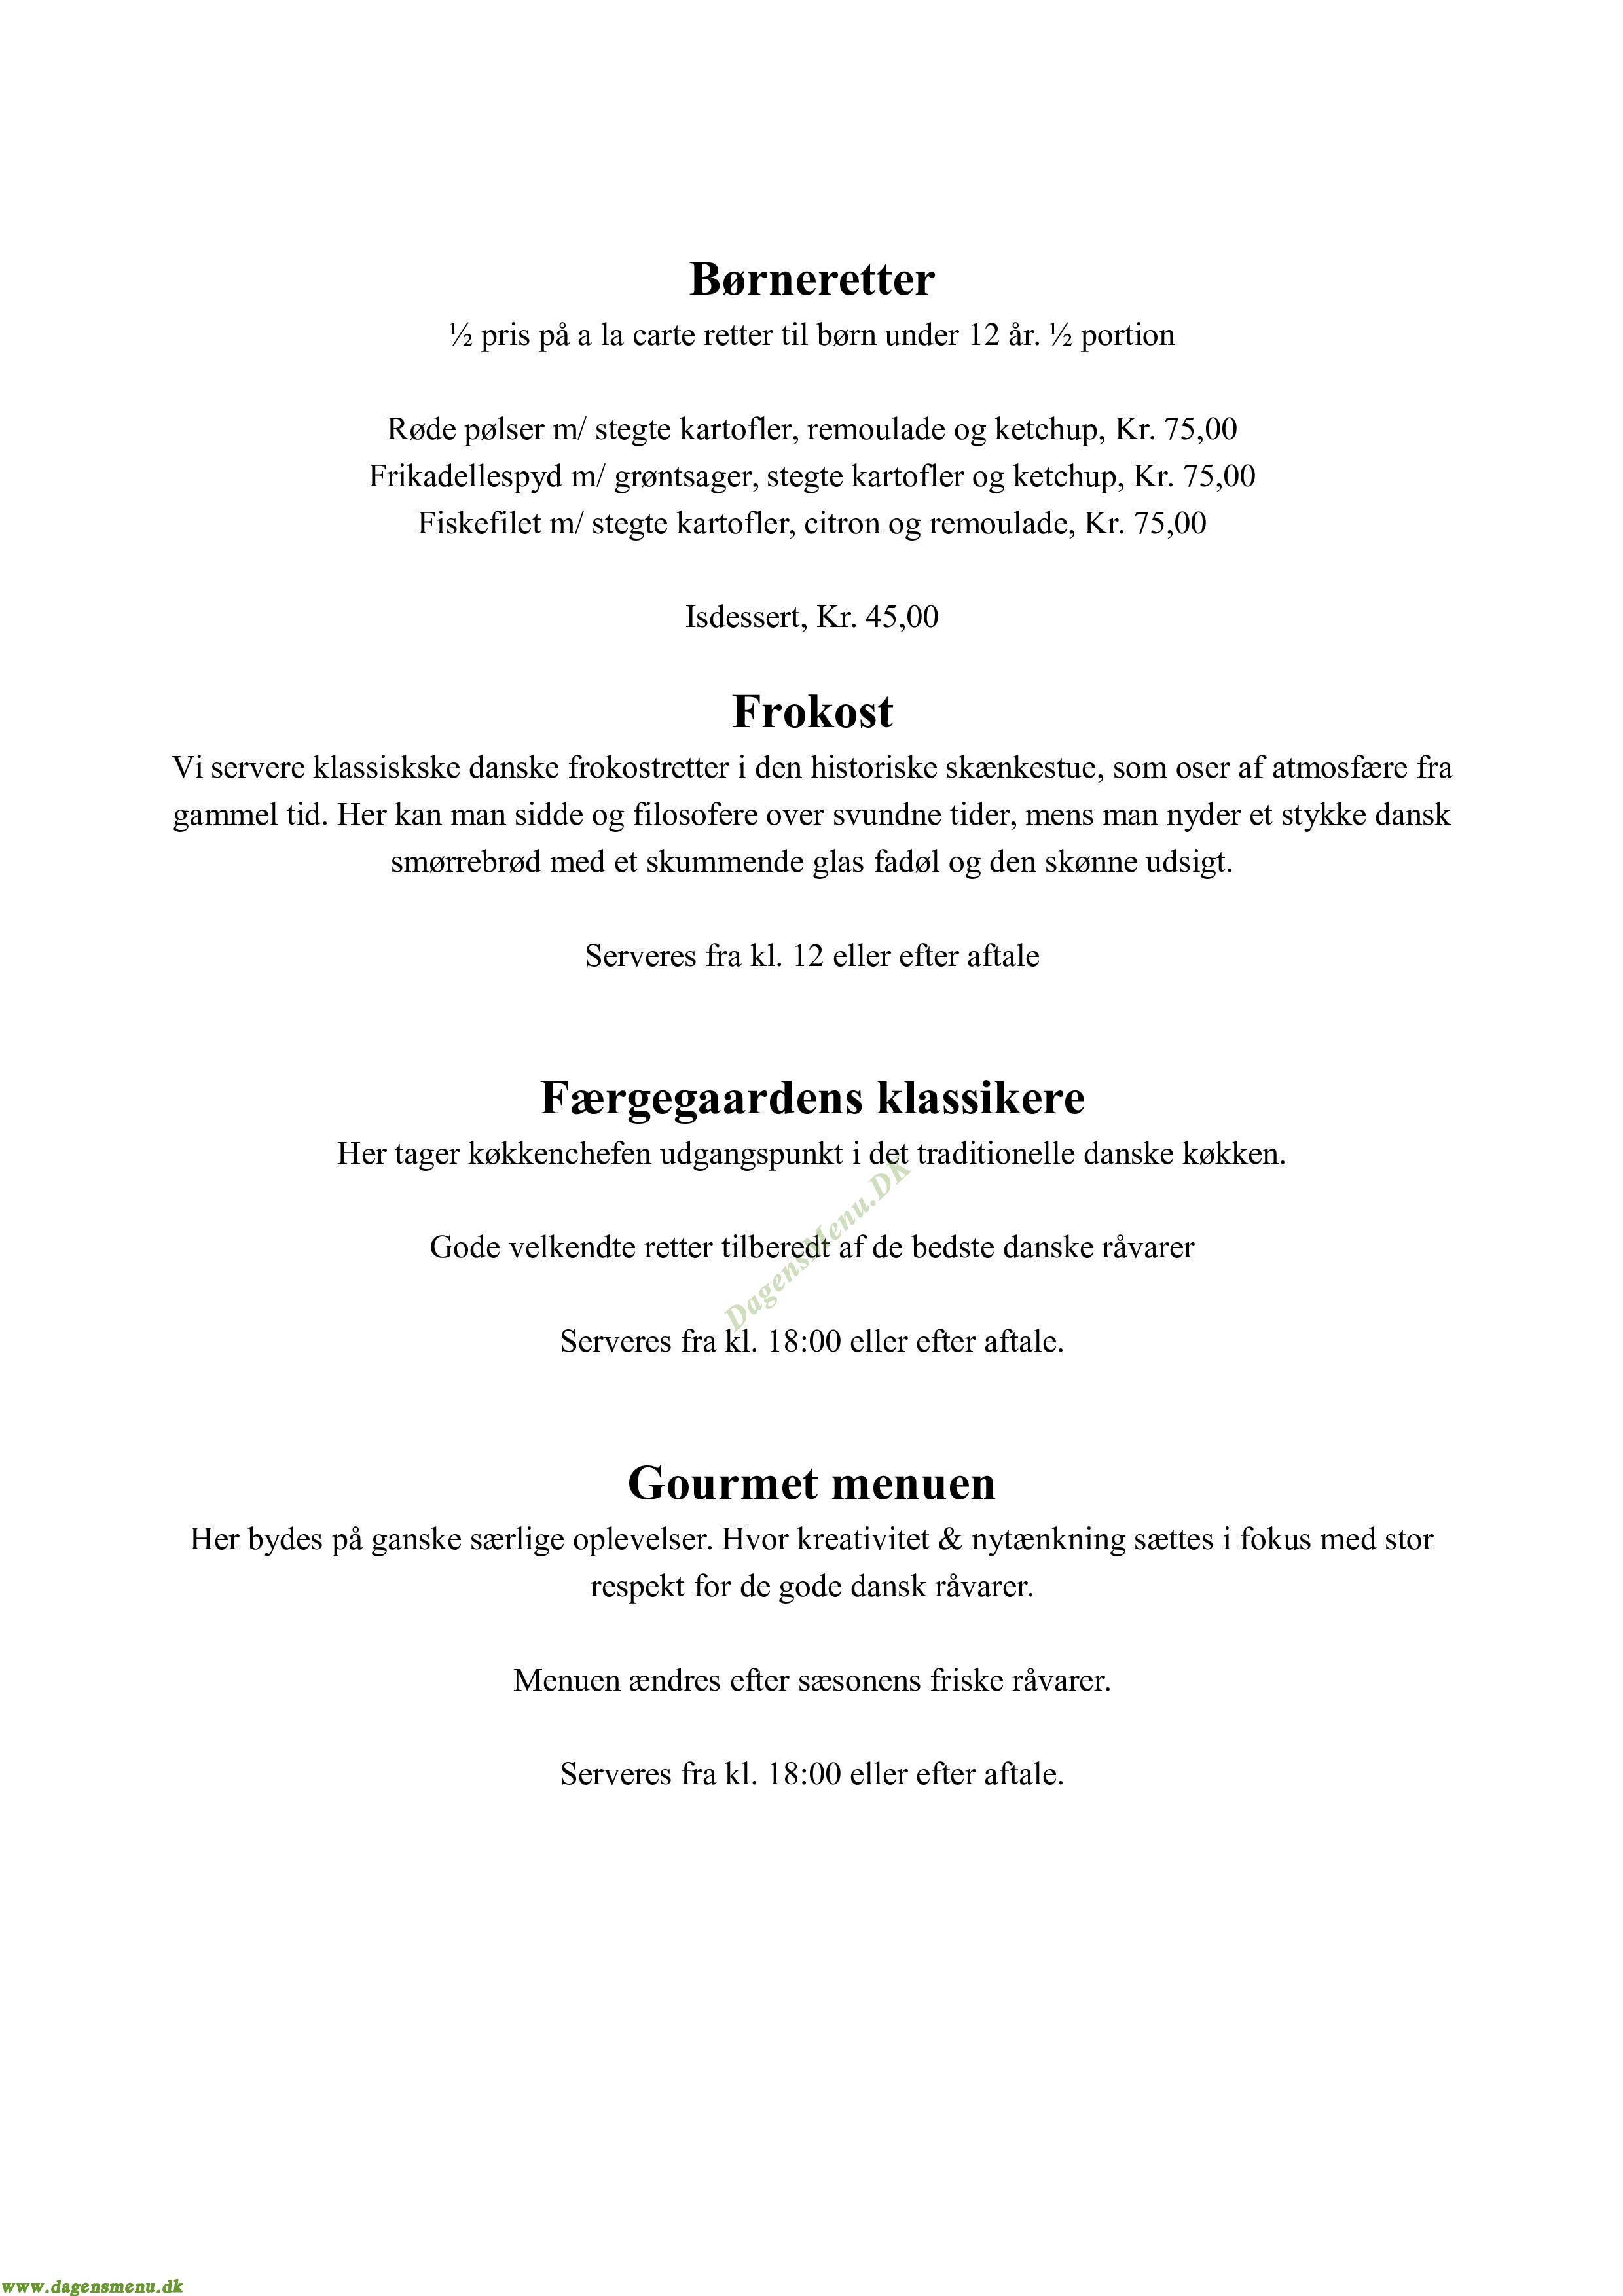 Hotel Færgegaarden - Menukort